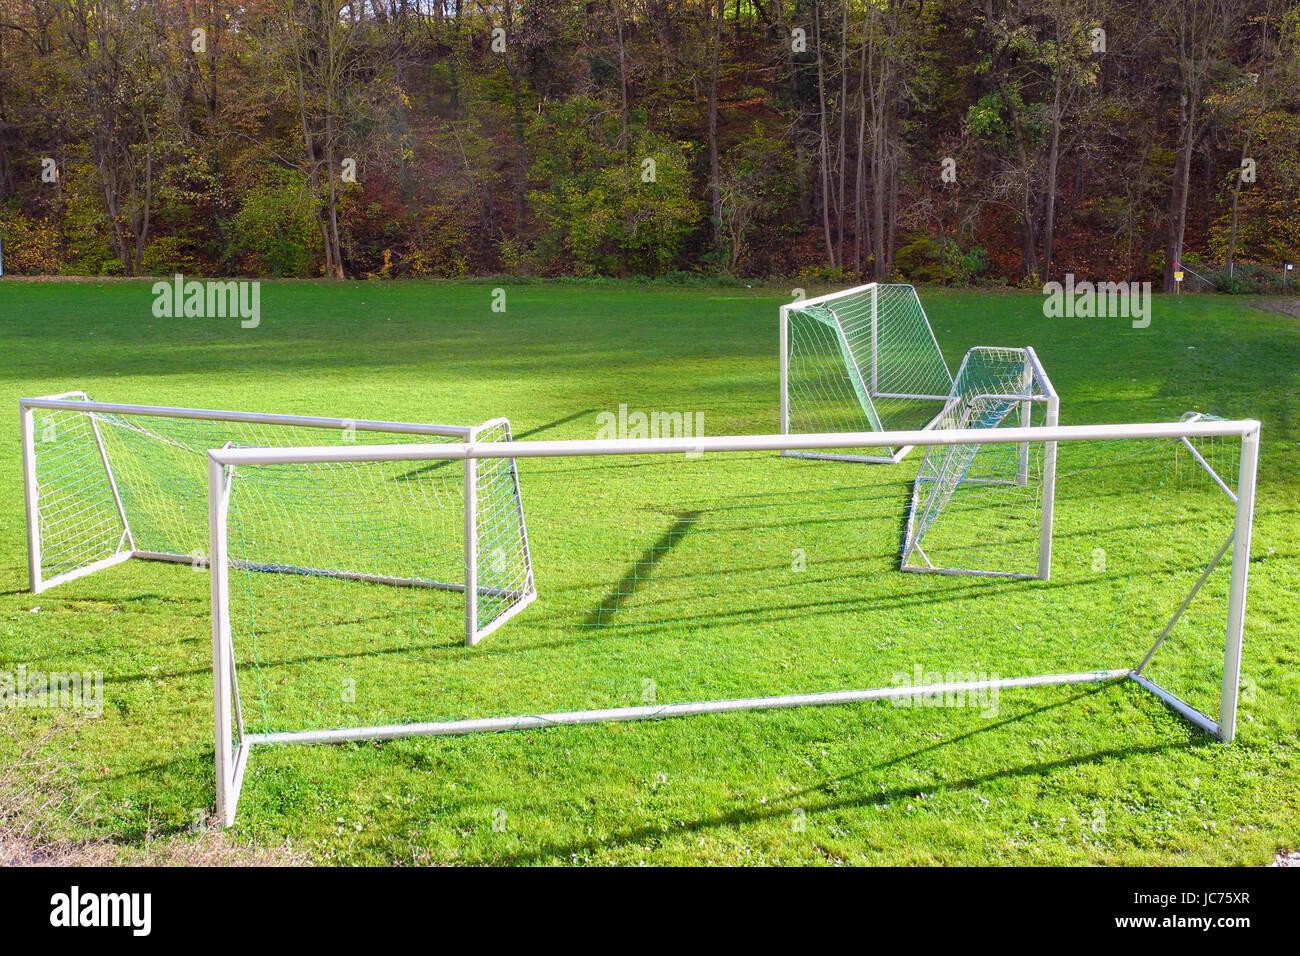 meadow sport - Stock Image